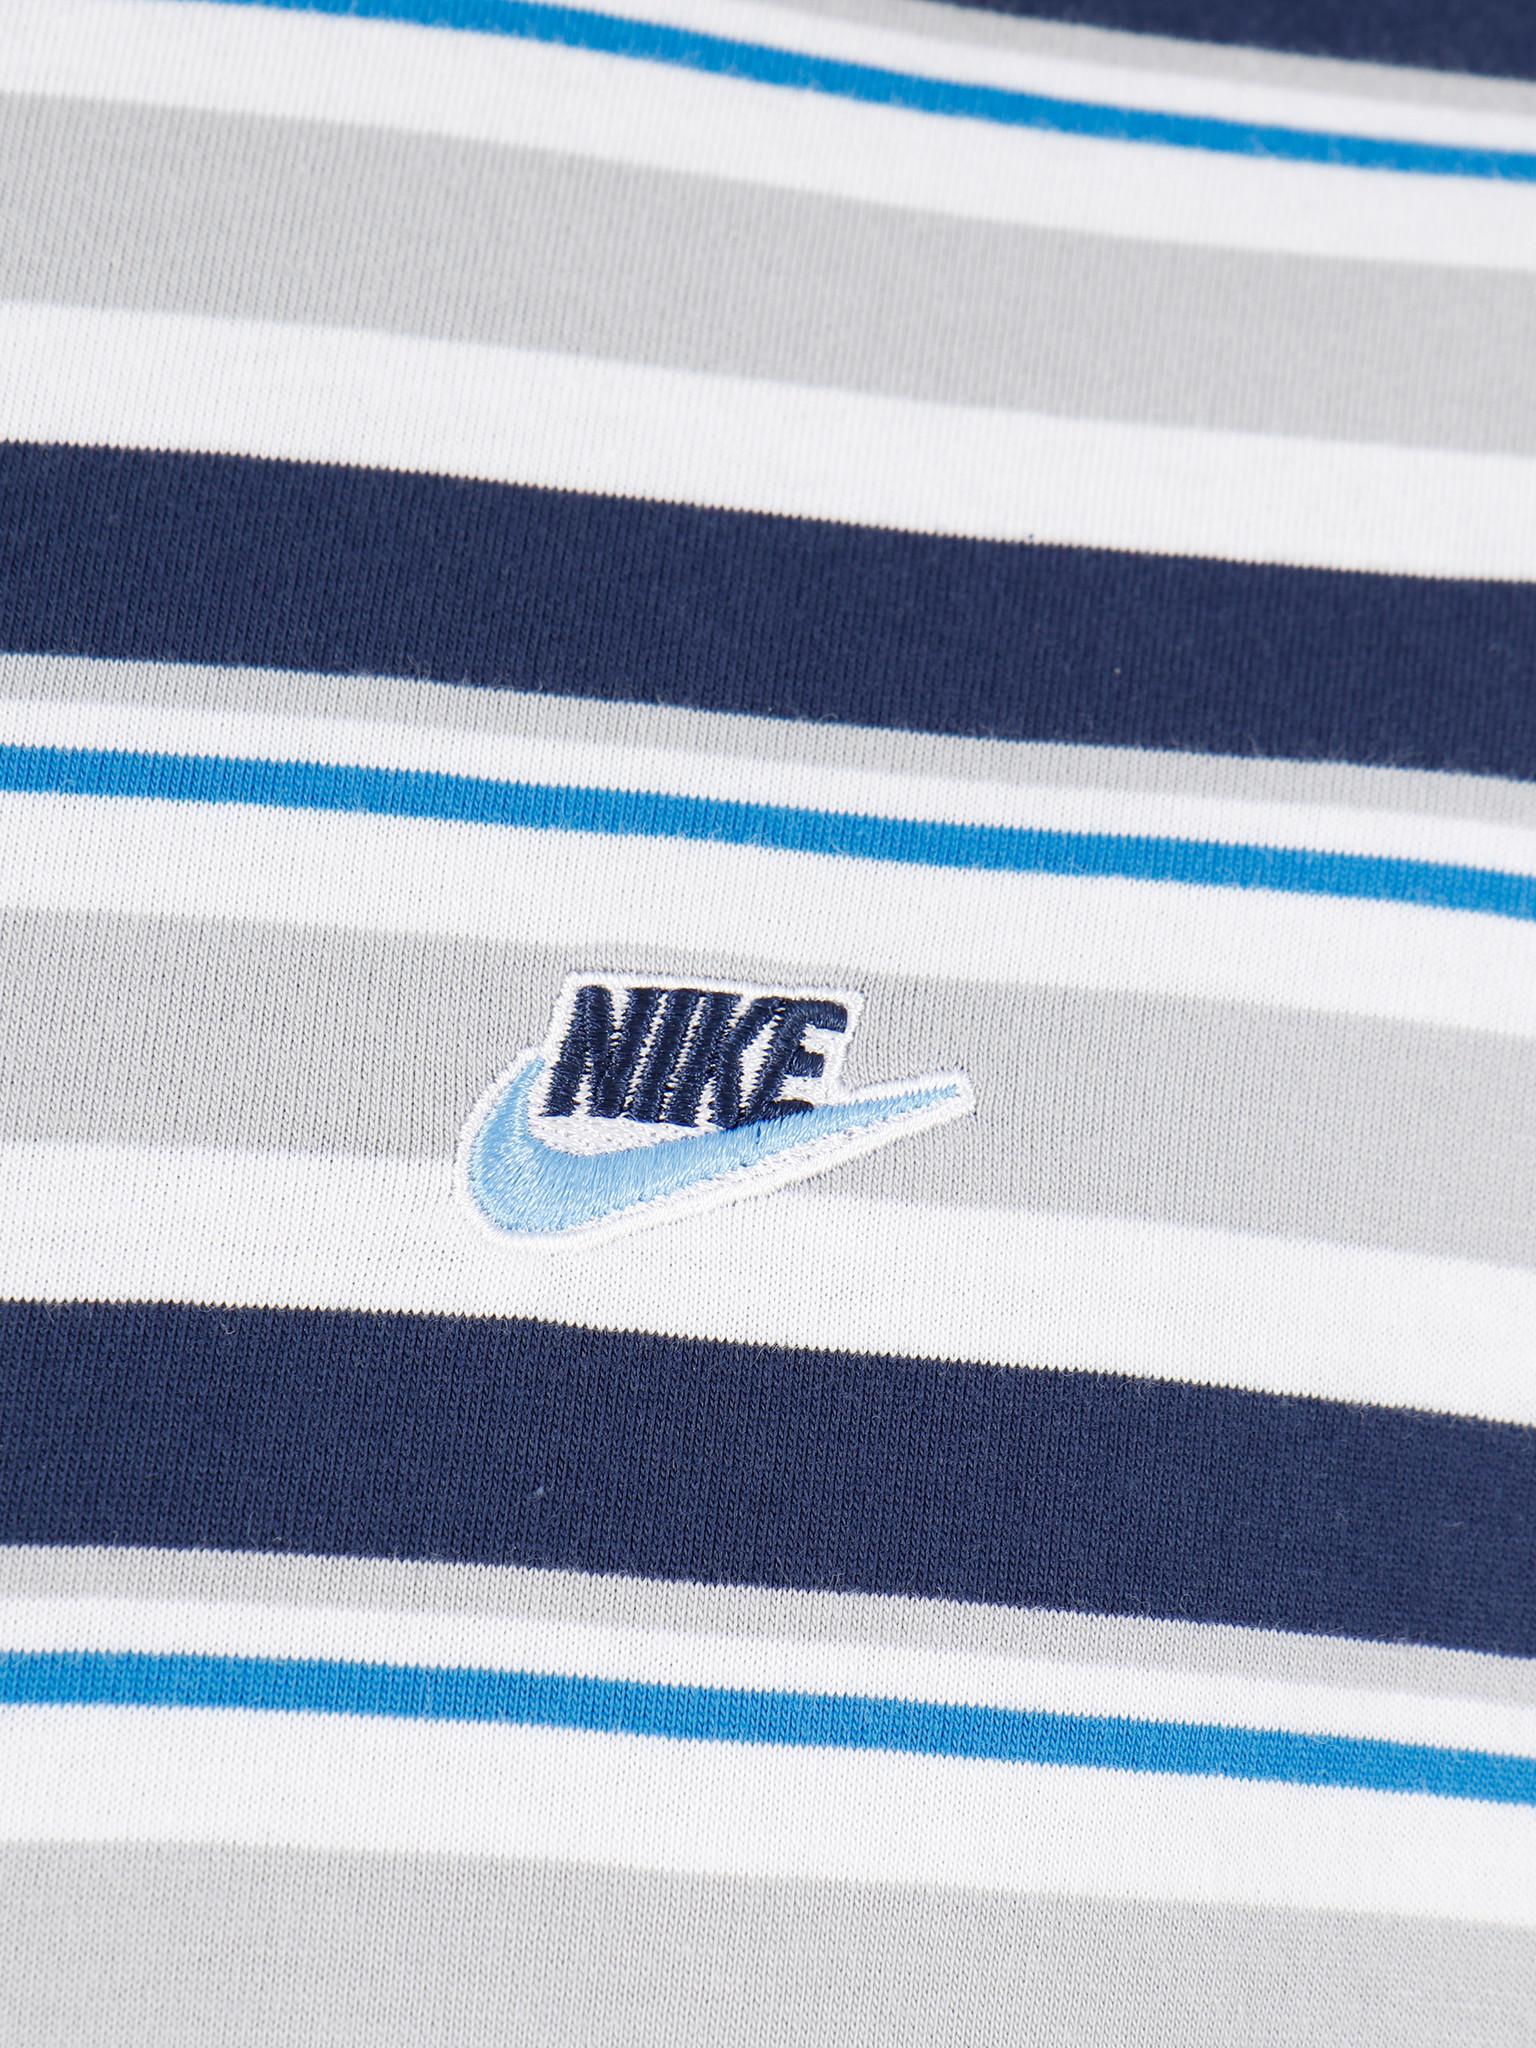 Nike Nike NSW T-shirt Stripe White CK2702-100